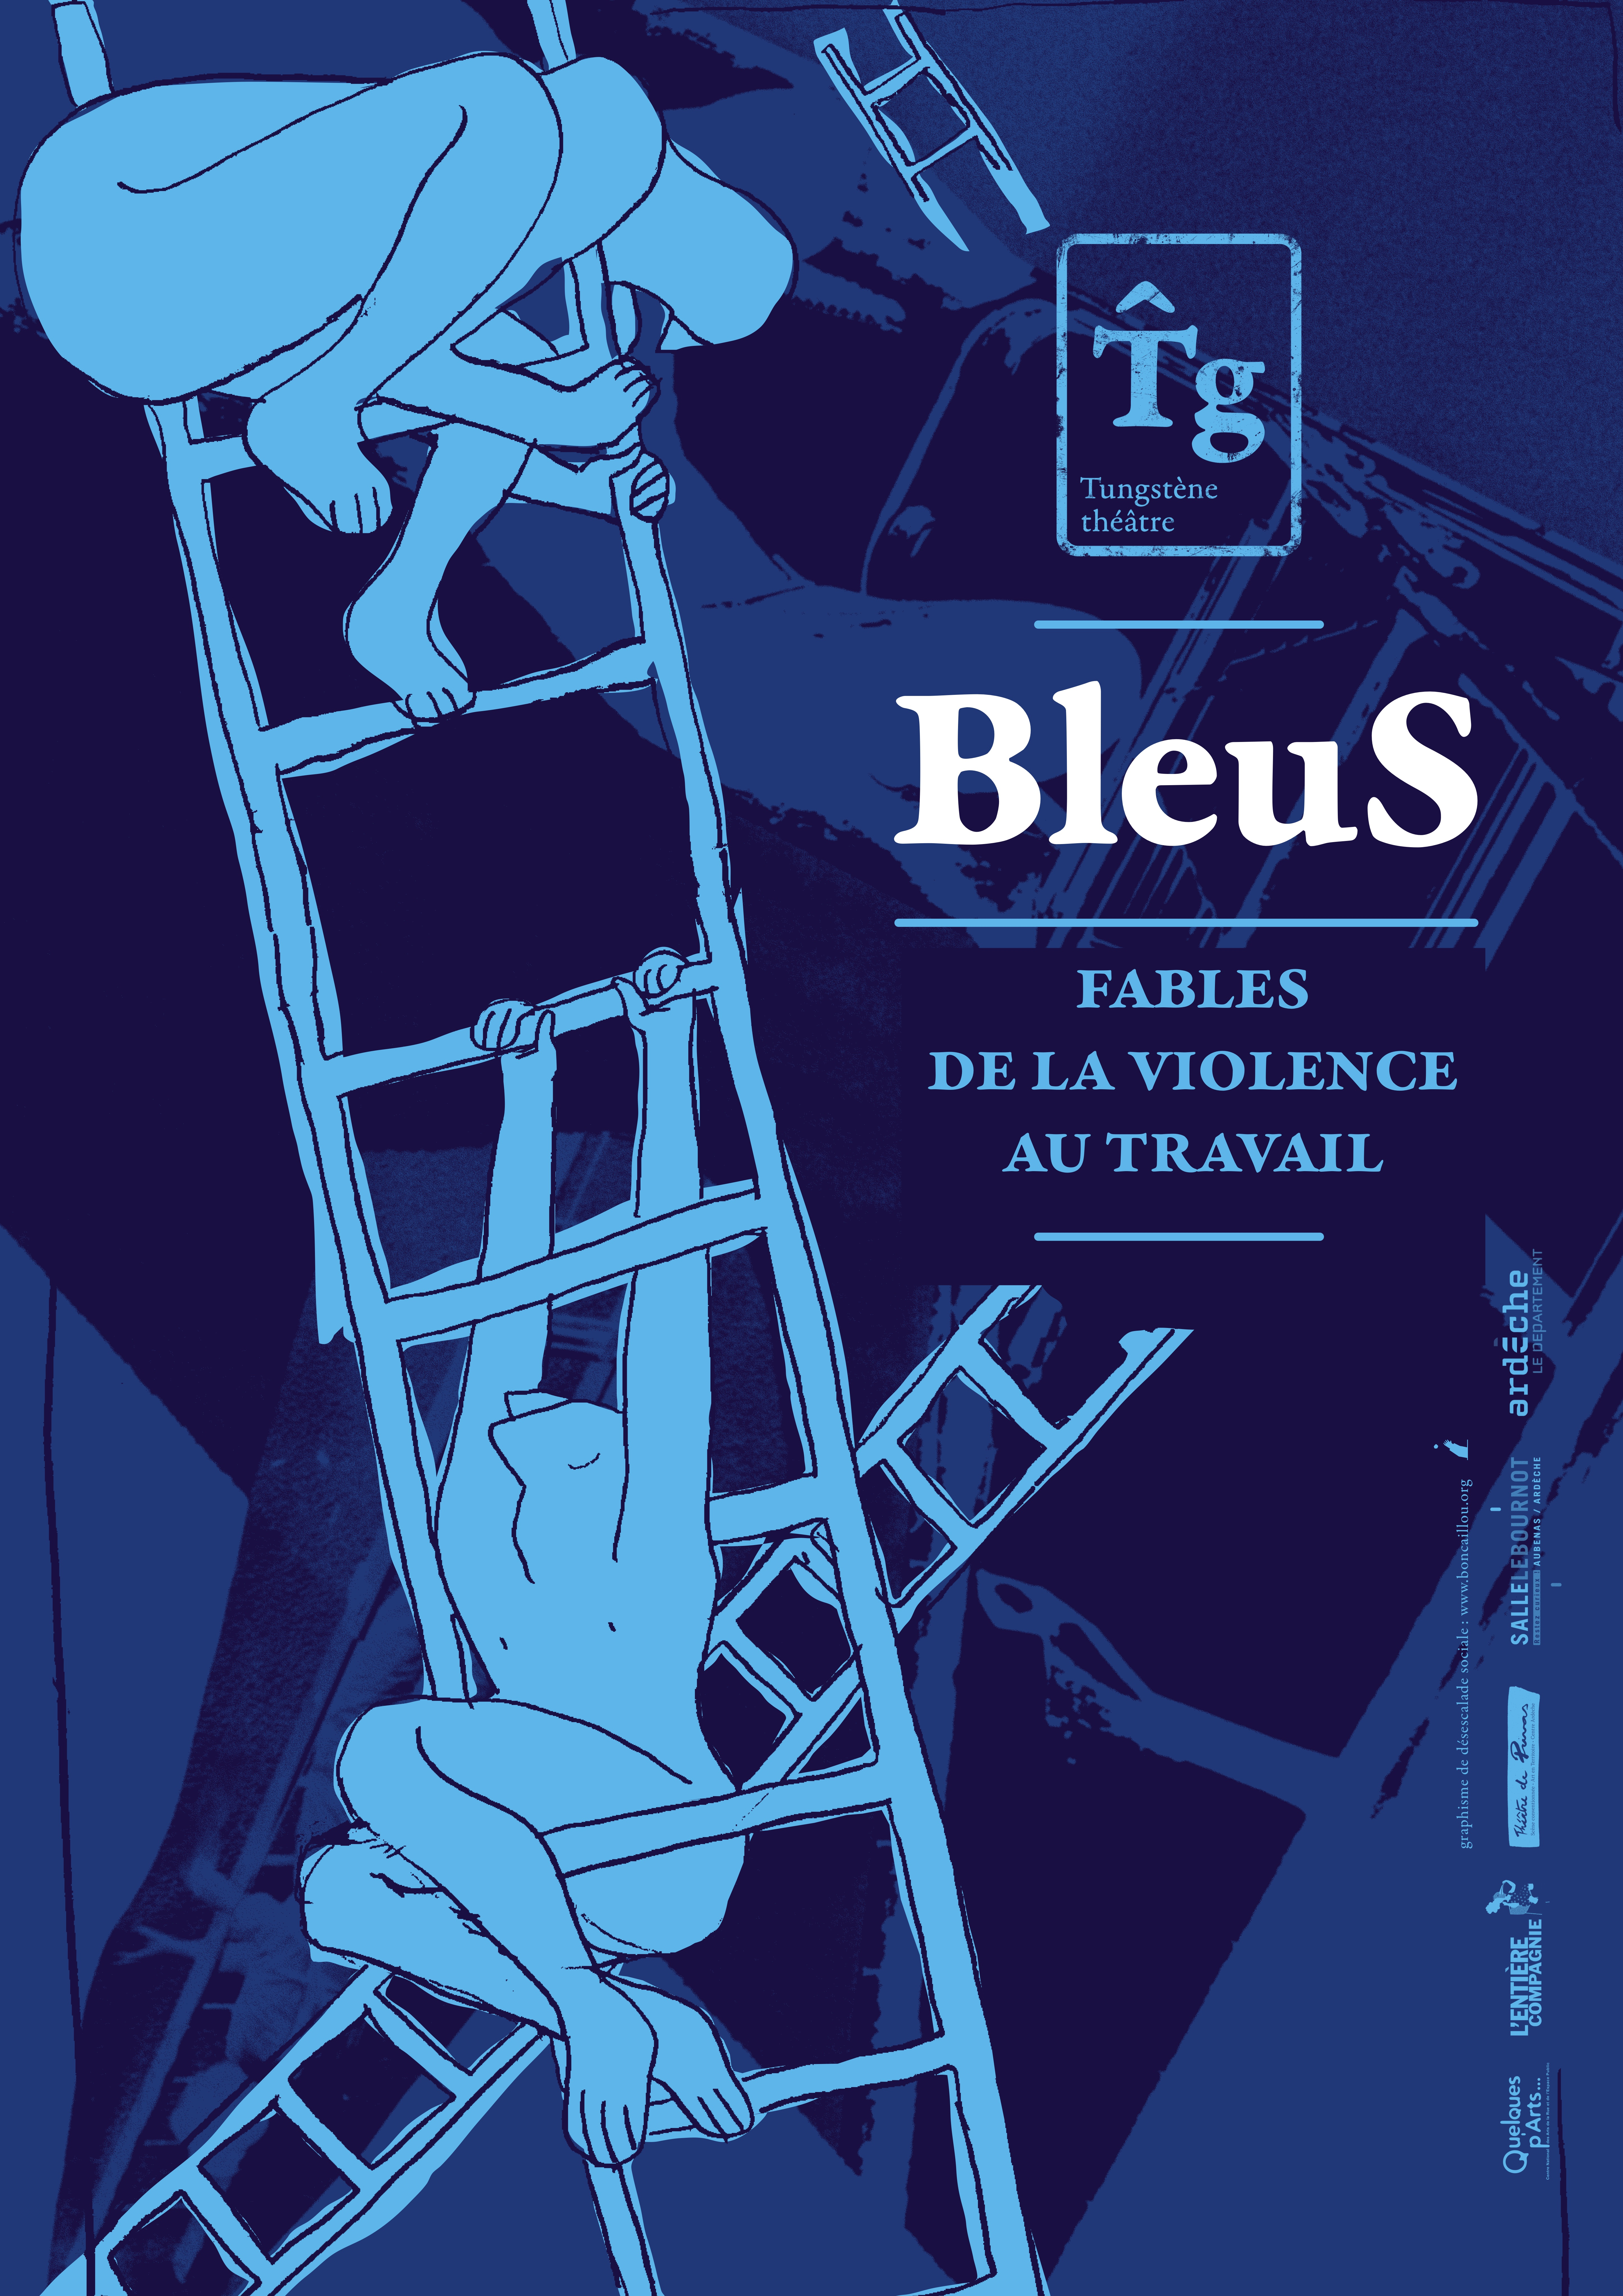 affiche bleus 5-B-2